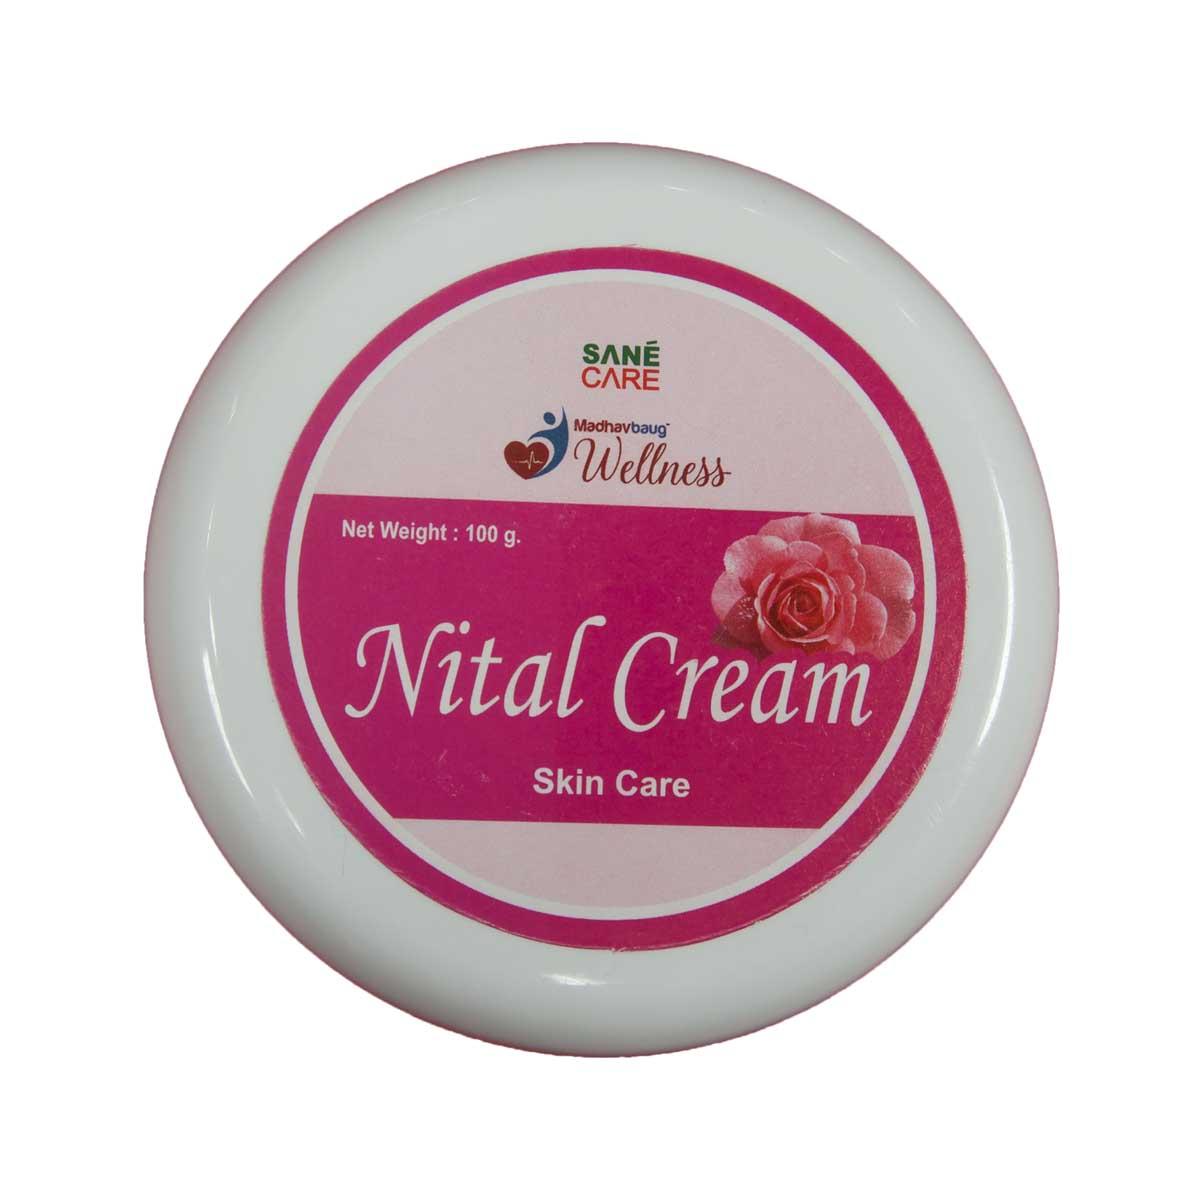 Sane Care Nital Cream Skin Care